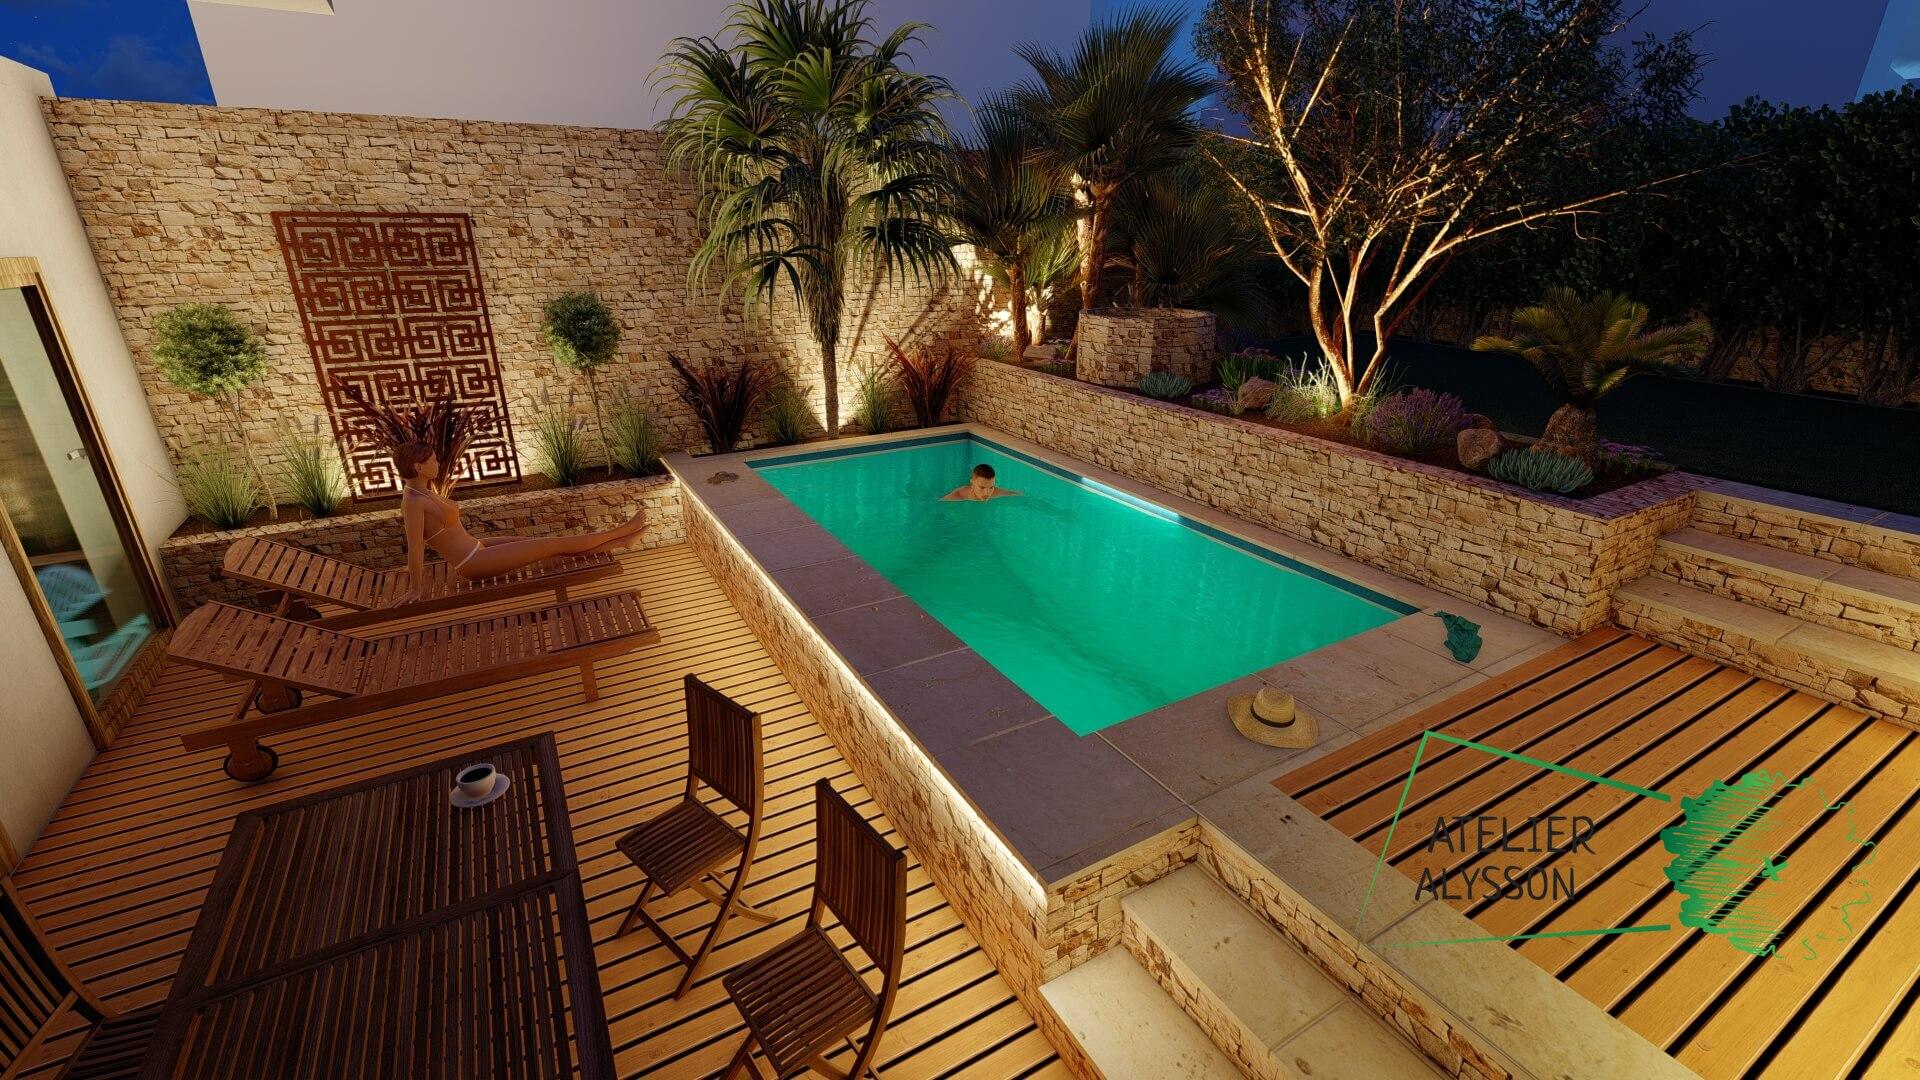 Jardin-a-etages-piscine-nuit-2